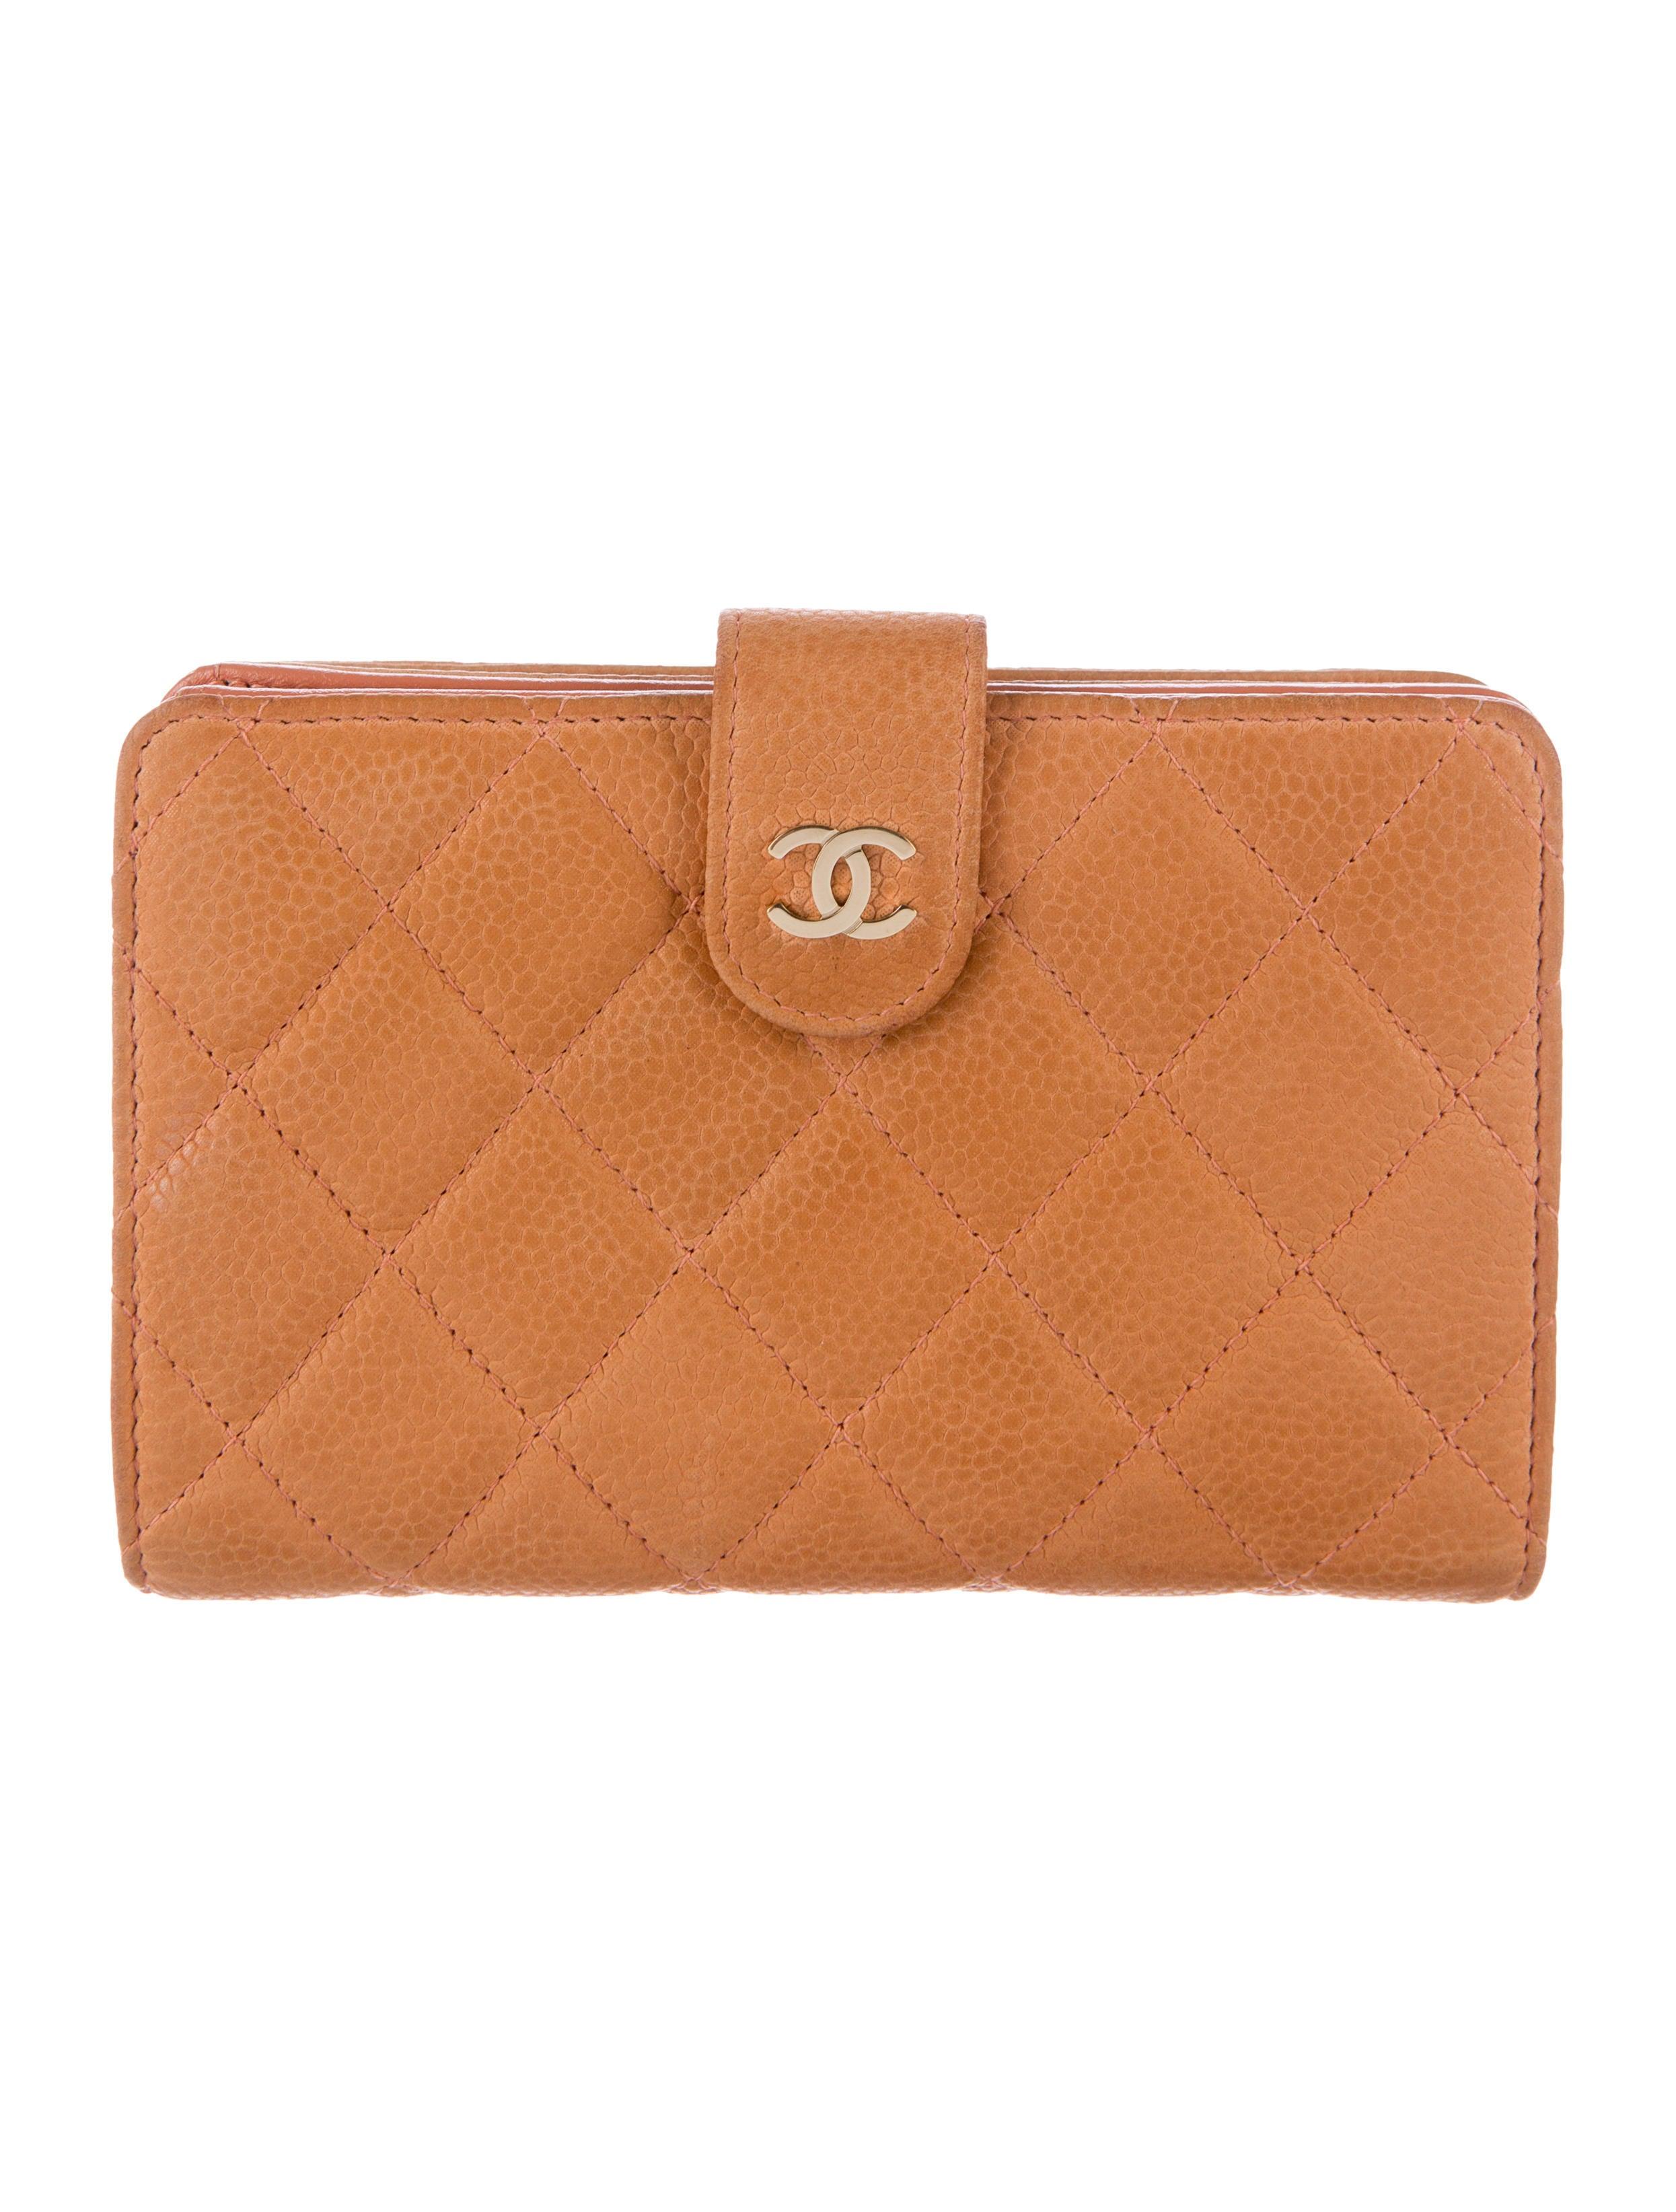 84aa150c6a4a Chanel Caviar L Zip Pocket Wallet Accessories Cha182072 The